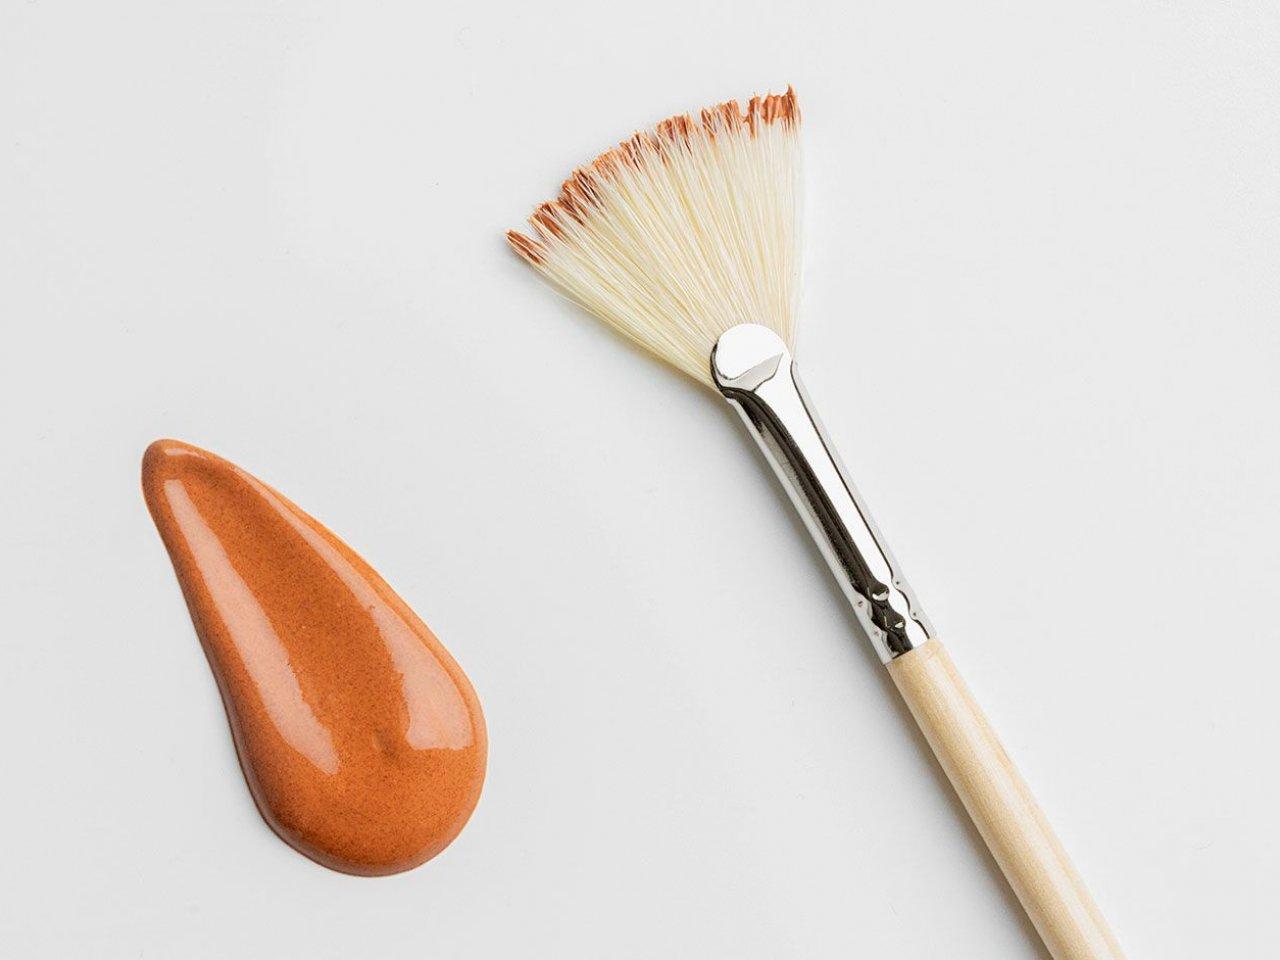 Maschera Viso Fai da Te Antiossidante + Gel Aloe Idratante - v6